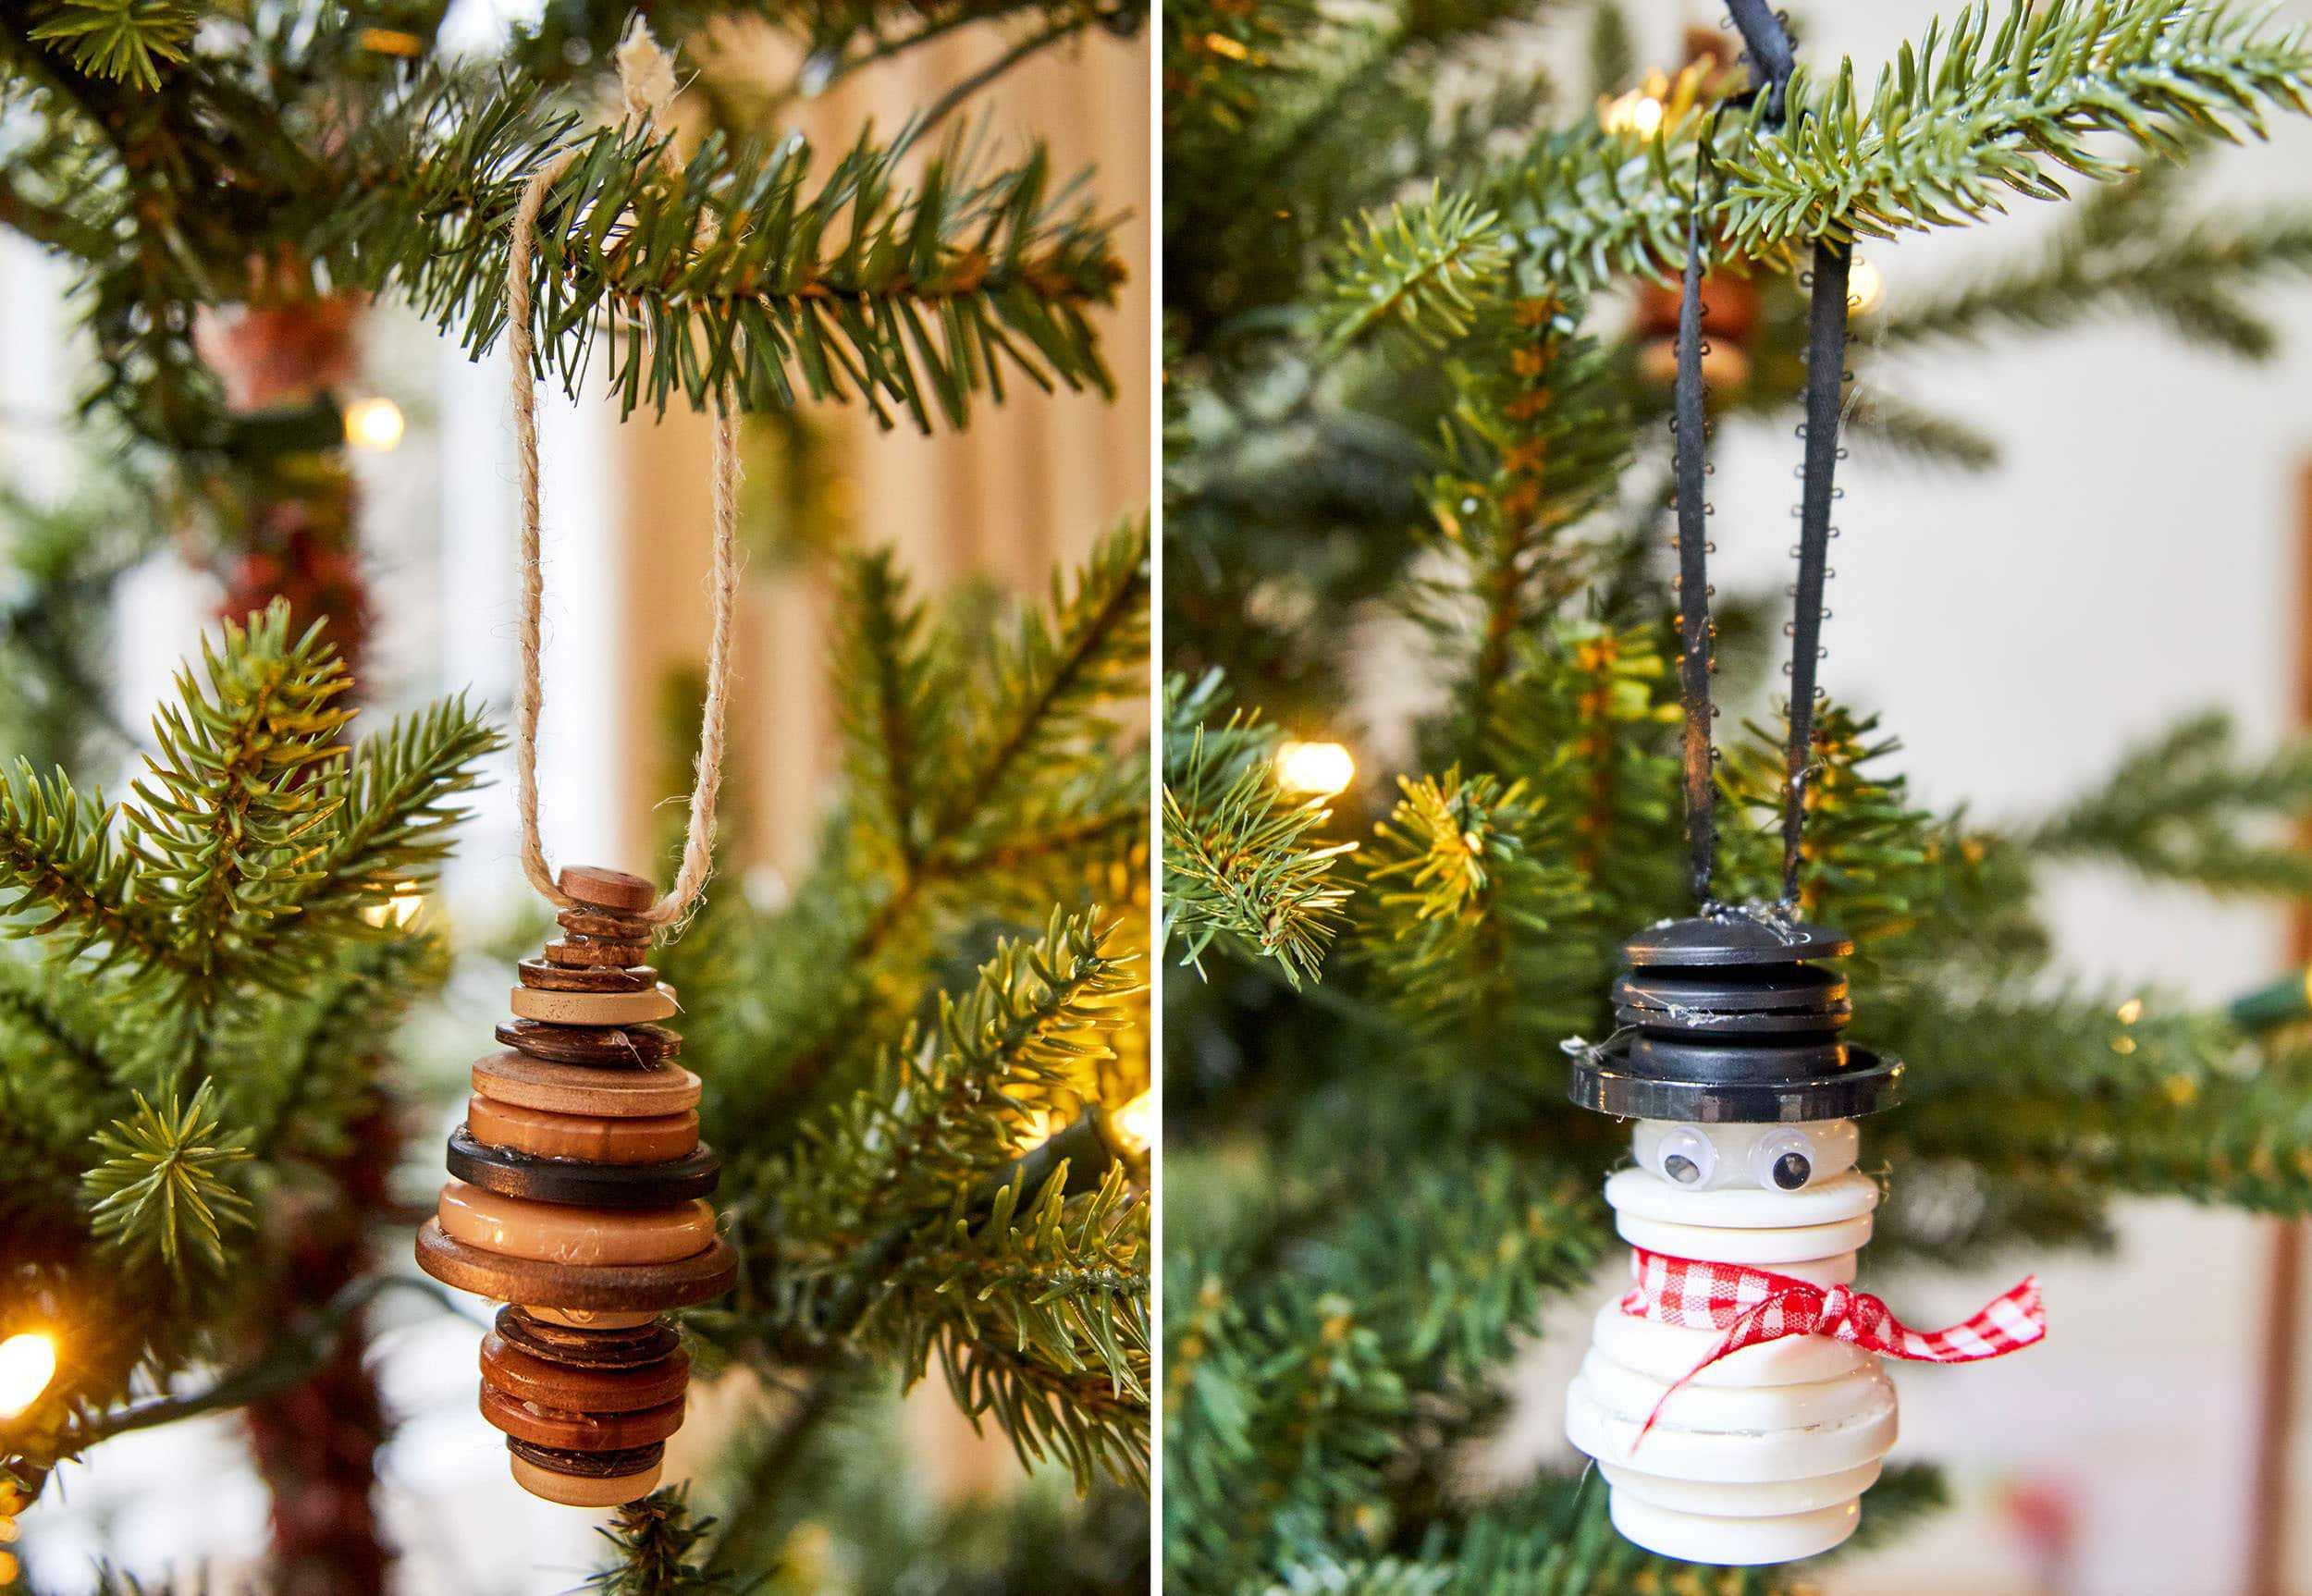 Emily Henderson Diy Ornaments Side By Side 2